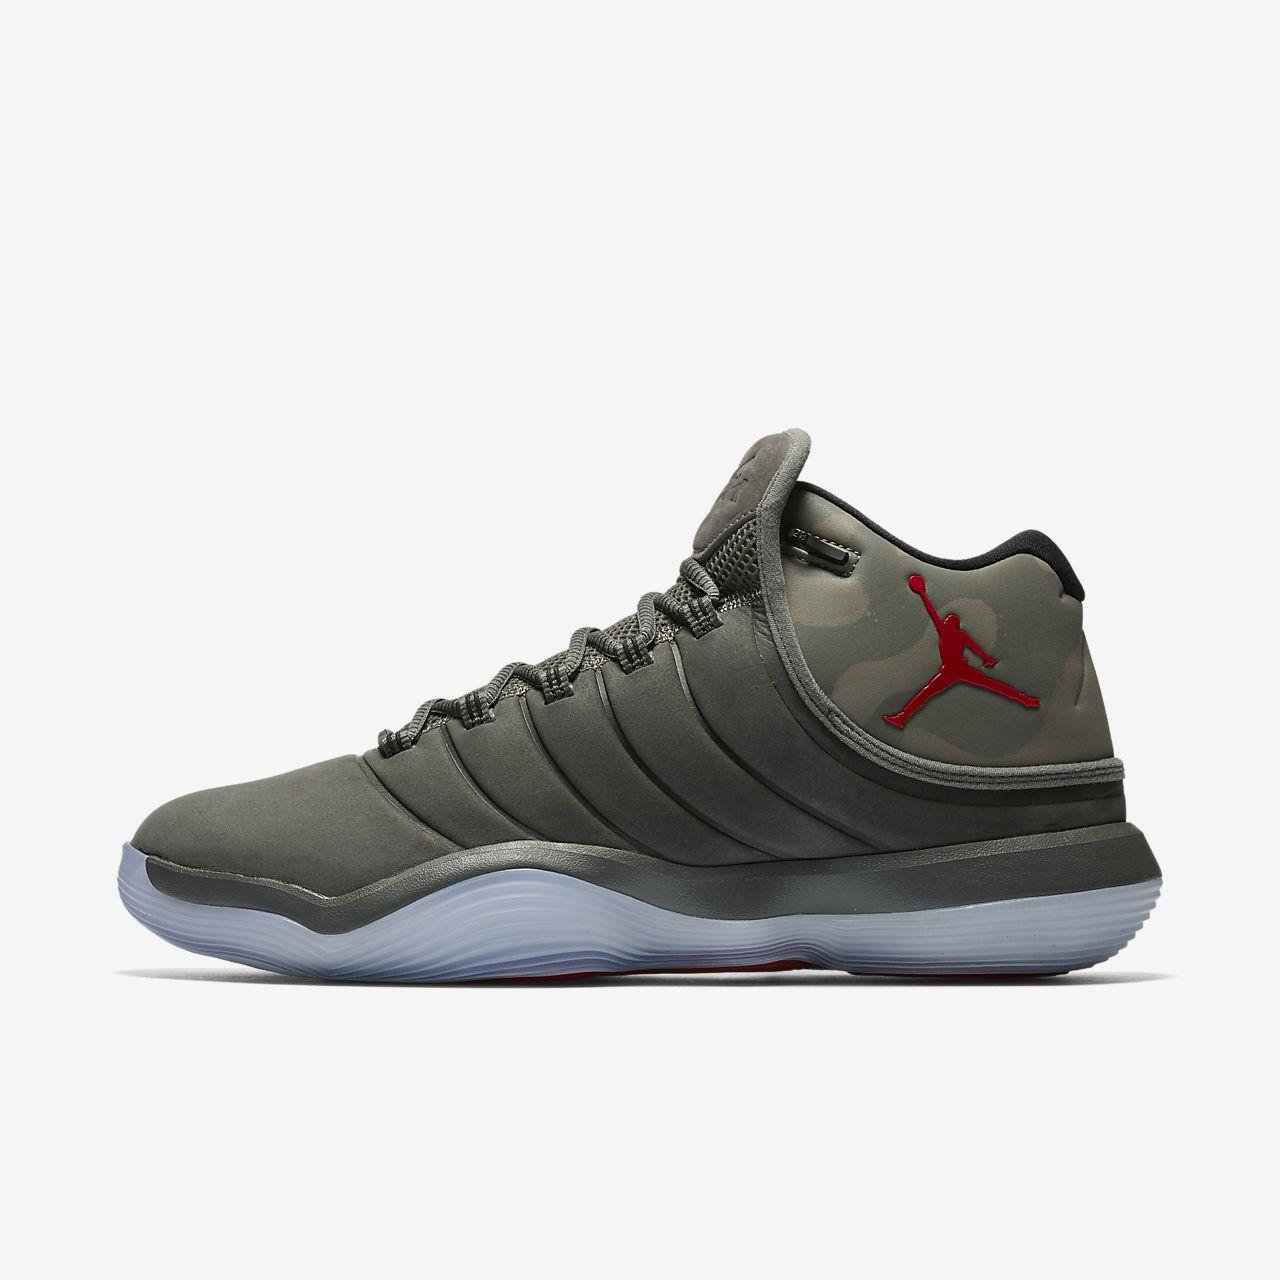 vapor nike tennis shoes womens nike jordans